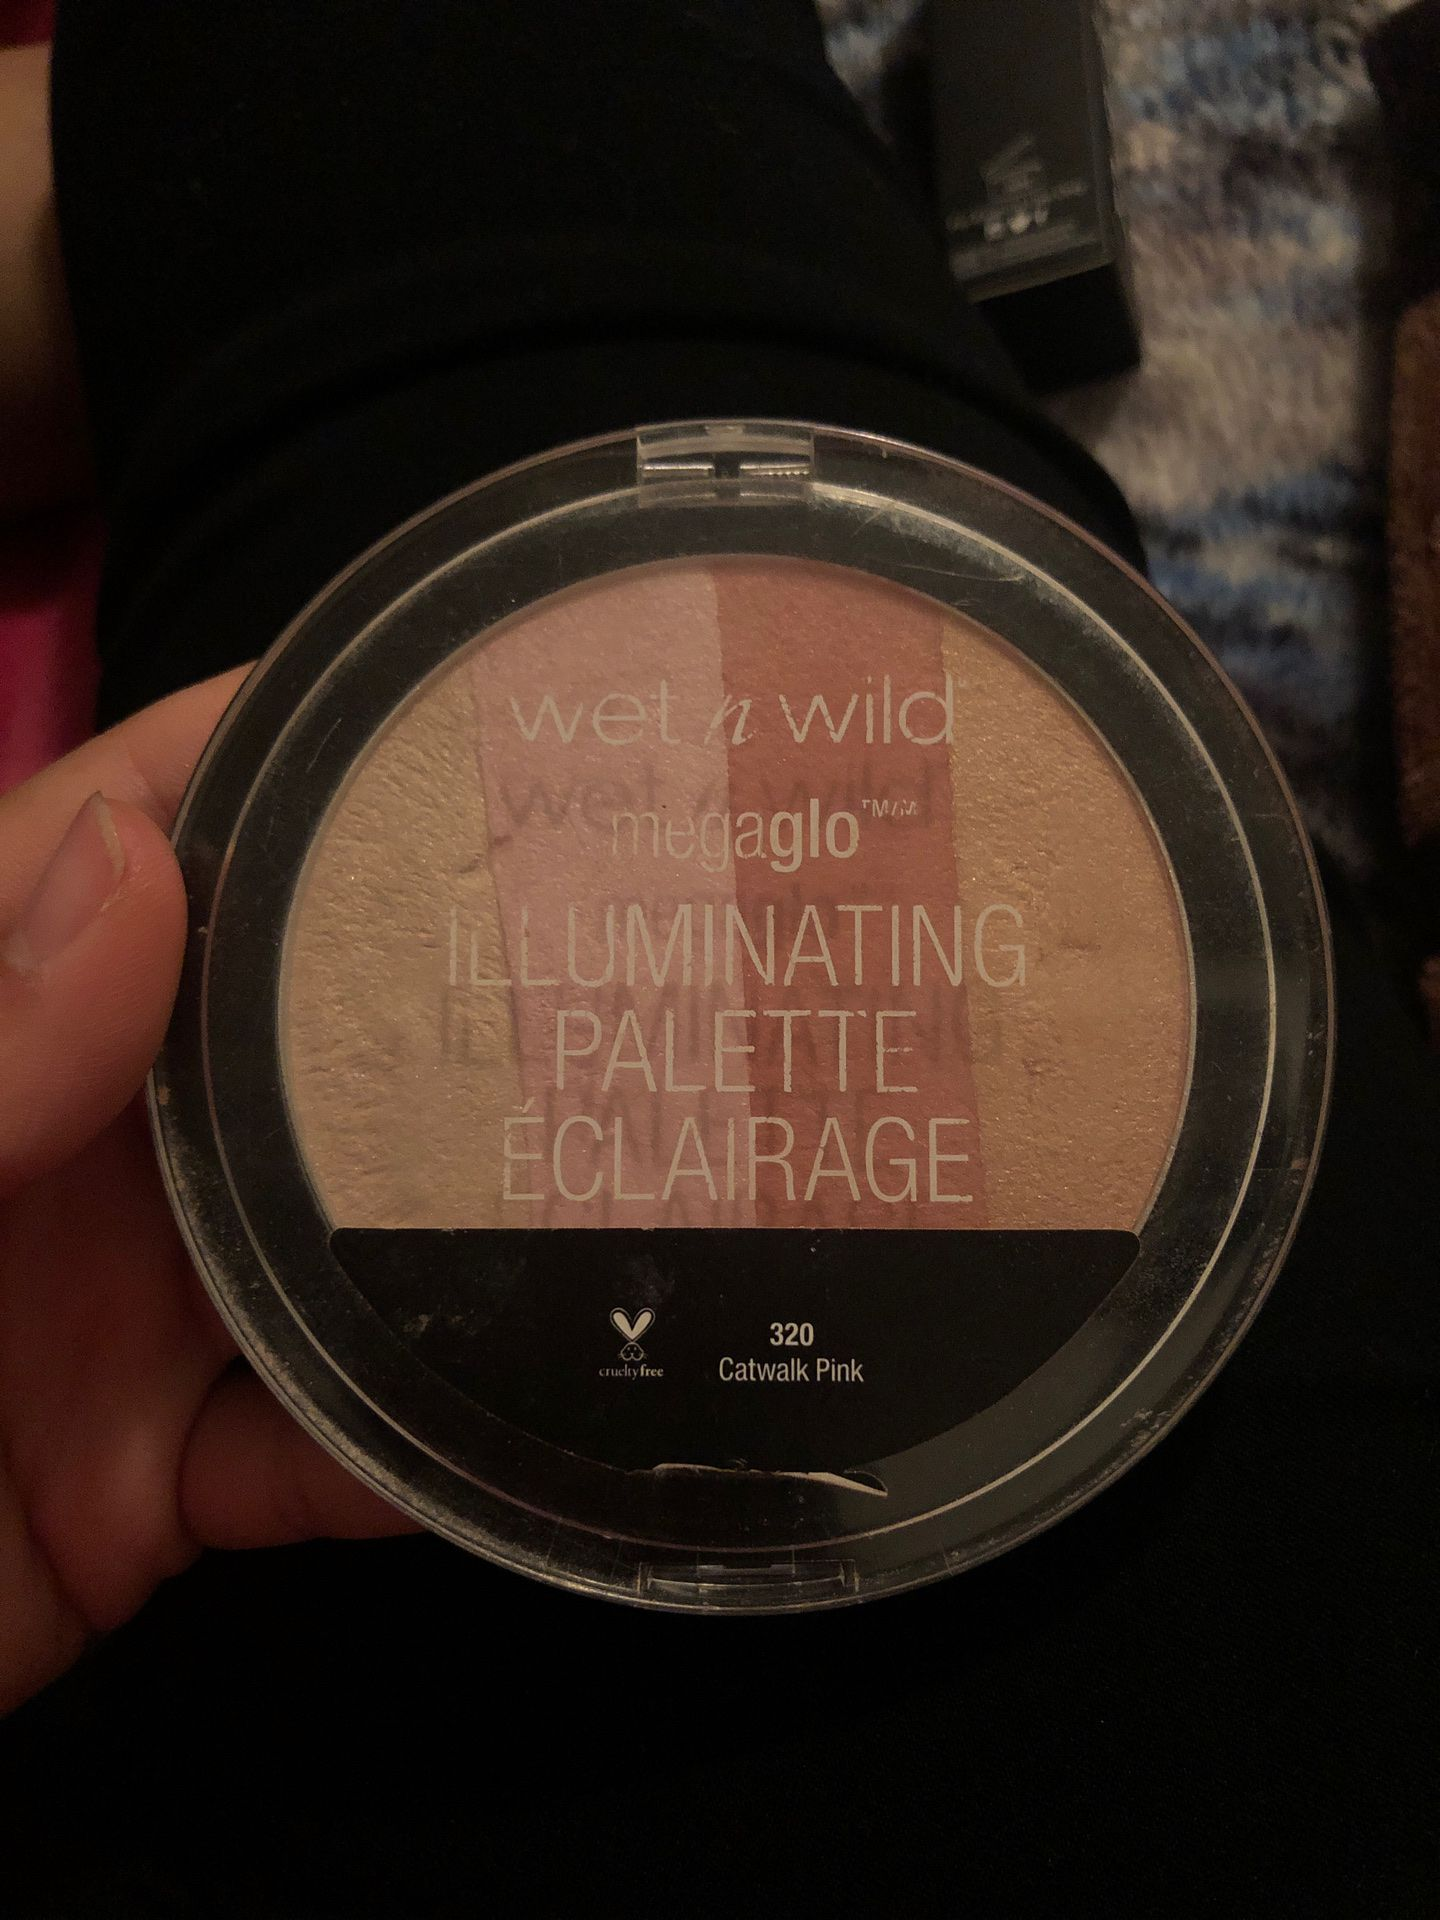 Wet n wild highlight palette